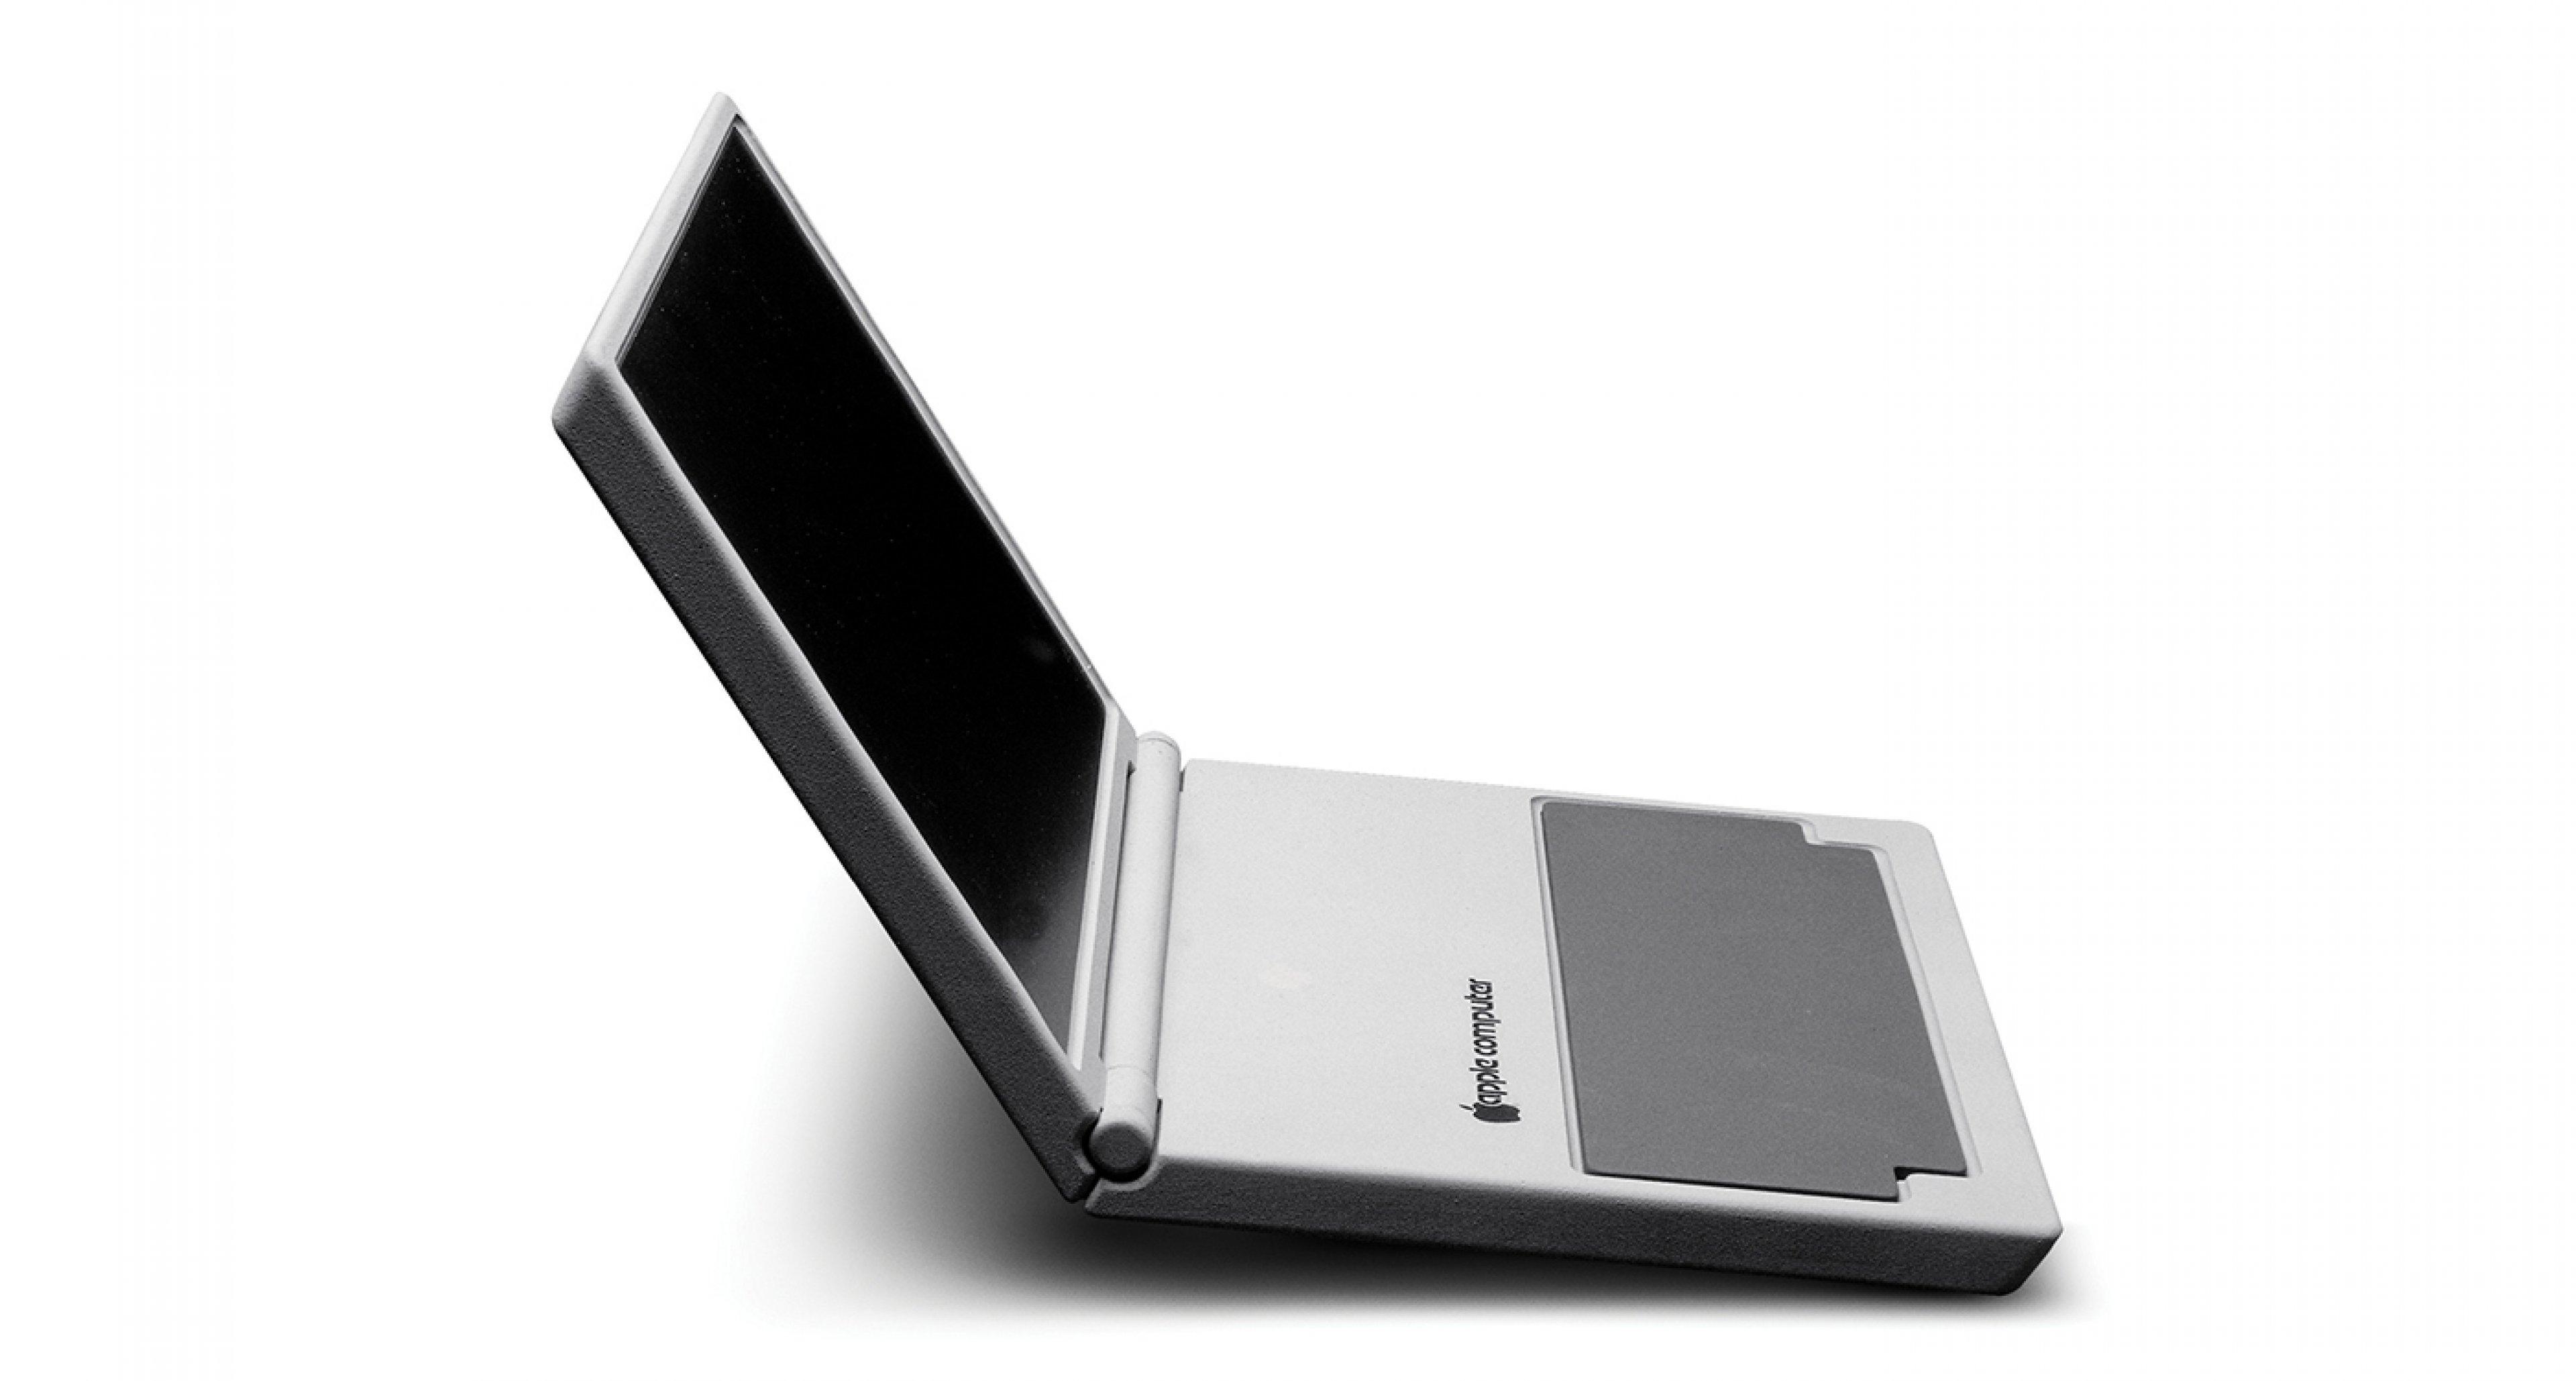 MacBook Conceptual Design Study, 1982